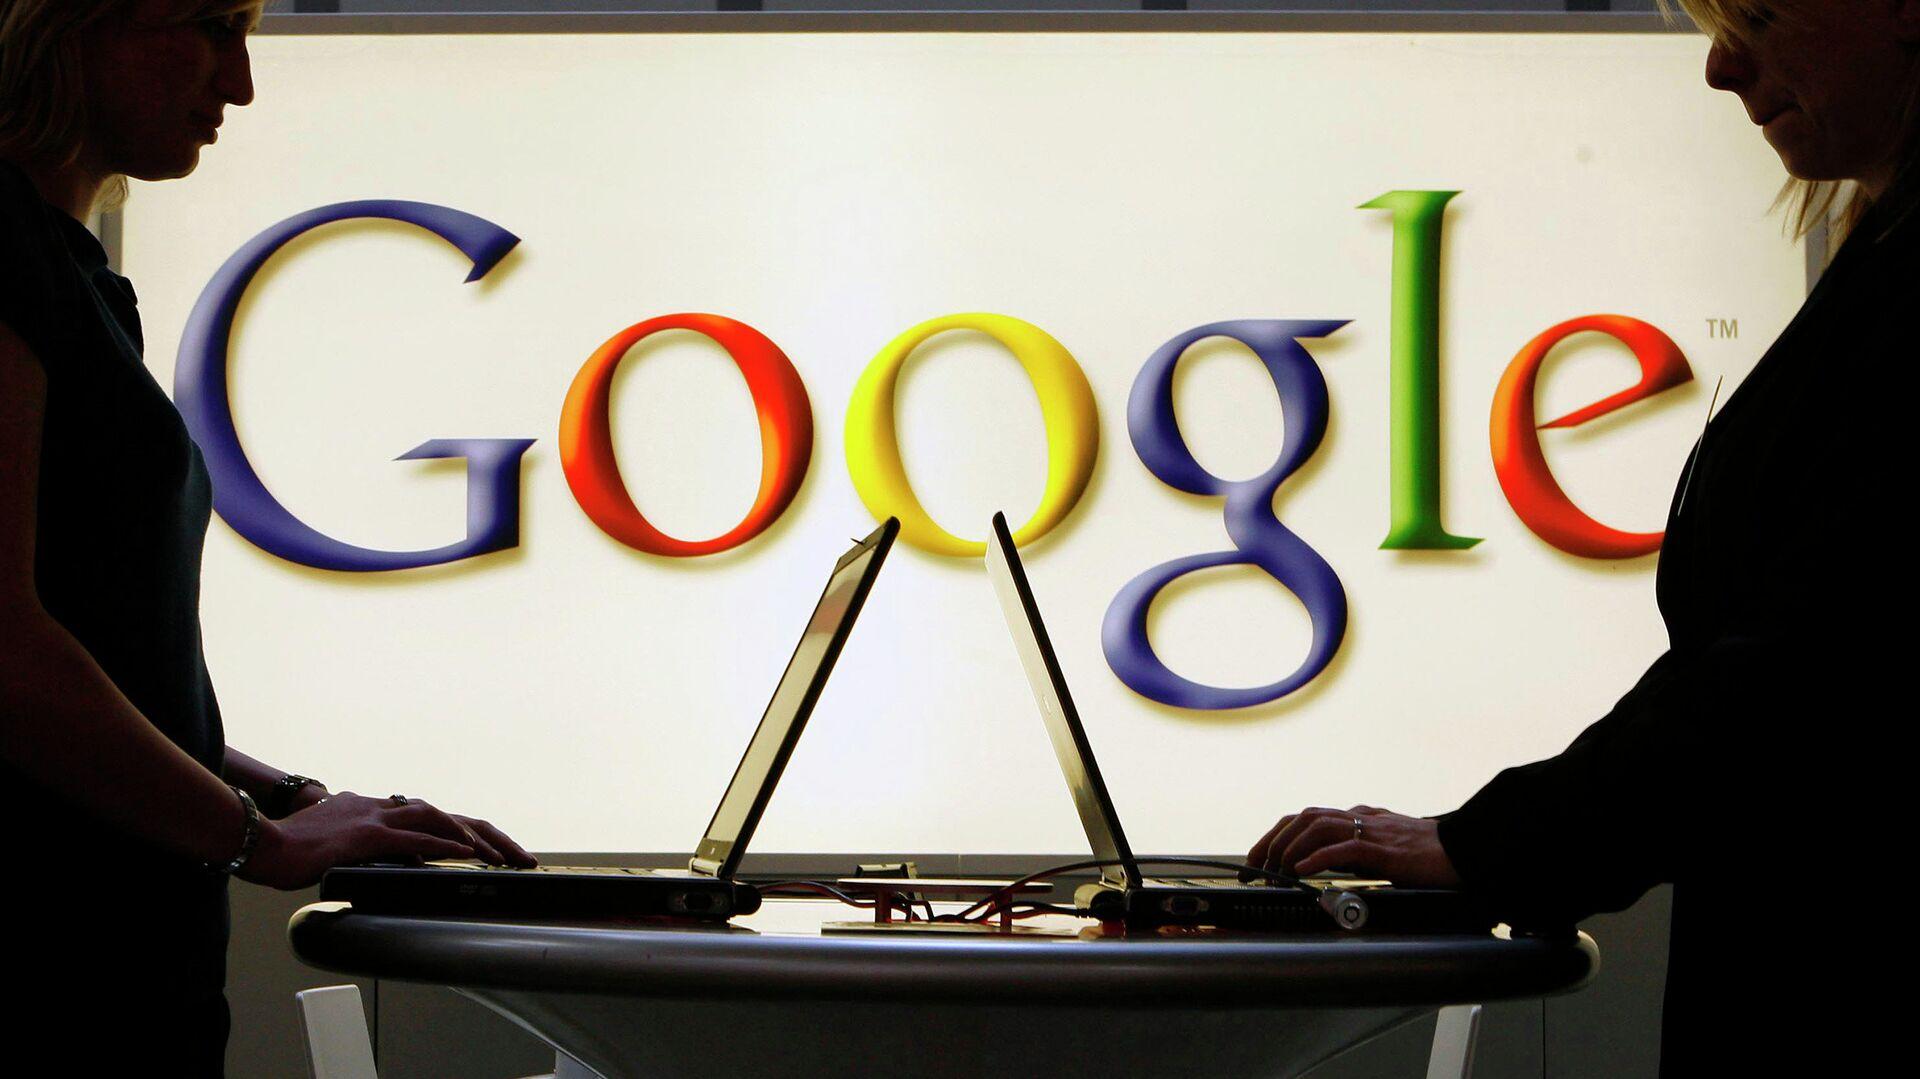 Девушки с ноутбуками на фоне логотипа Google - РИА Новости, 1920, 17.12.2020